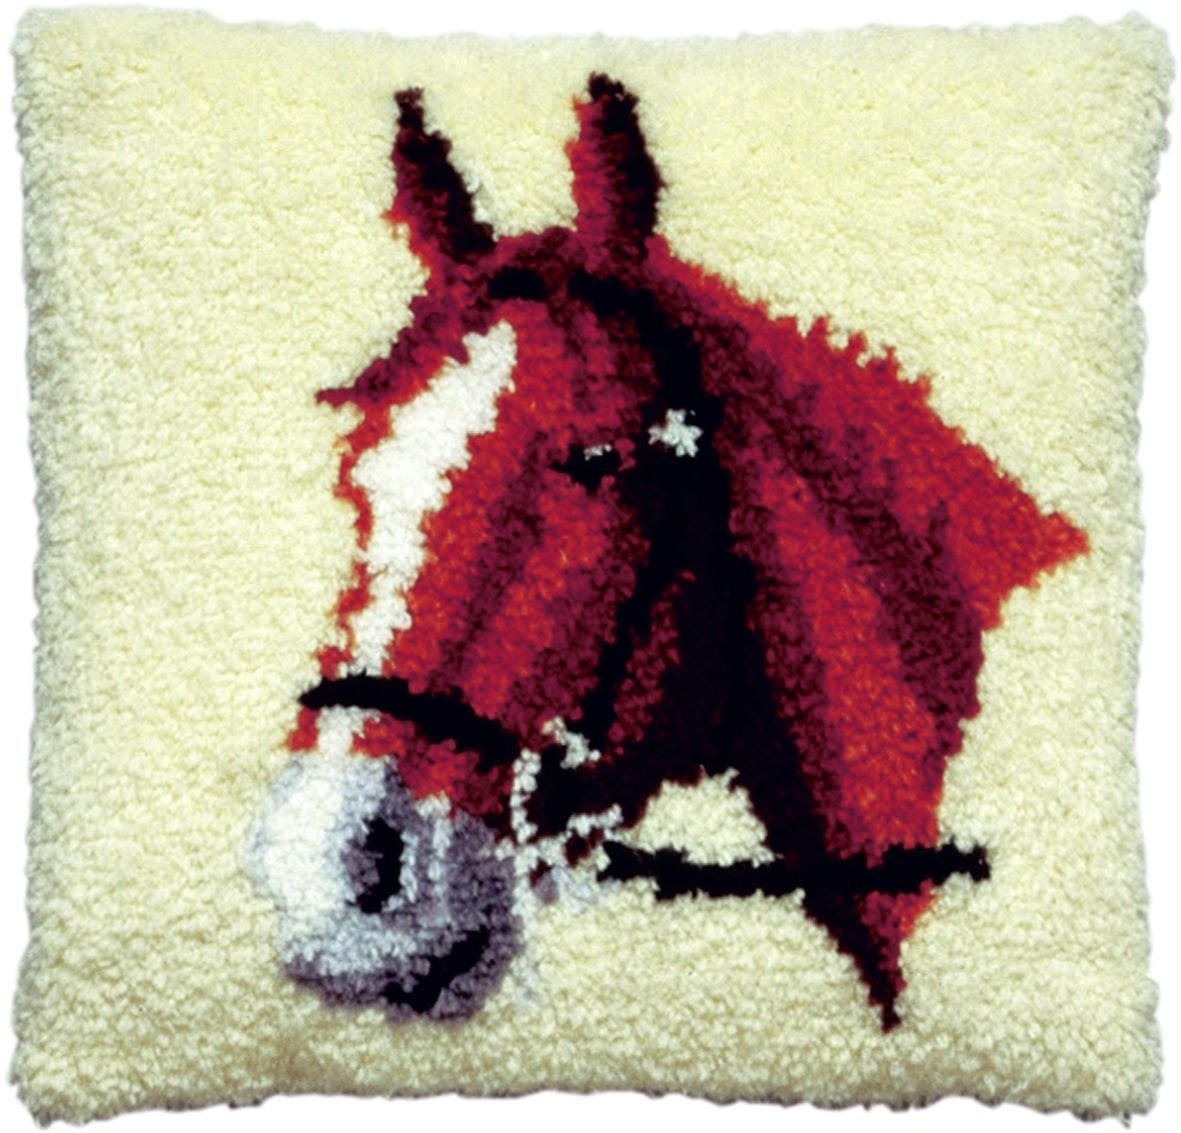 knoopkussen paard